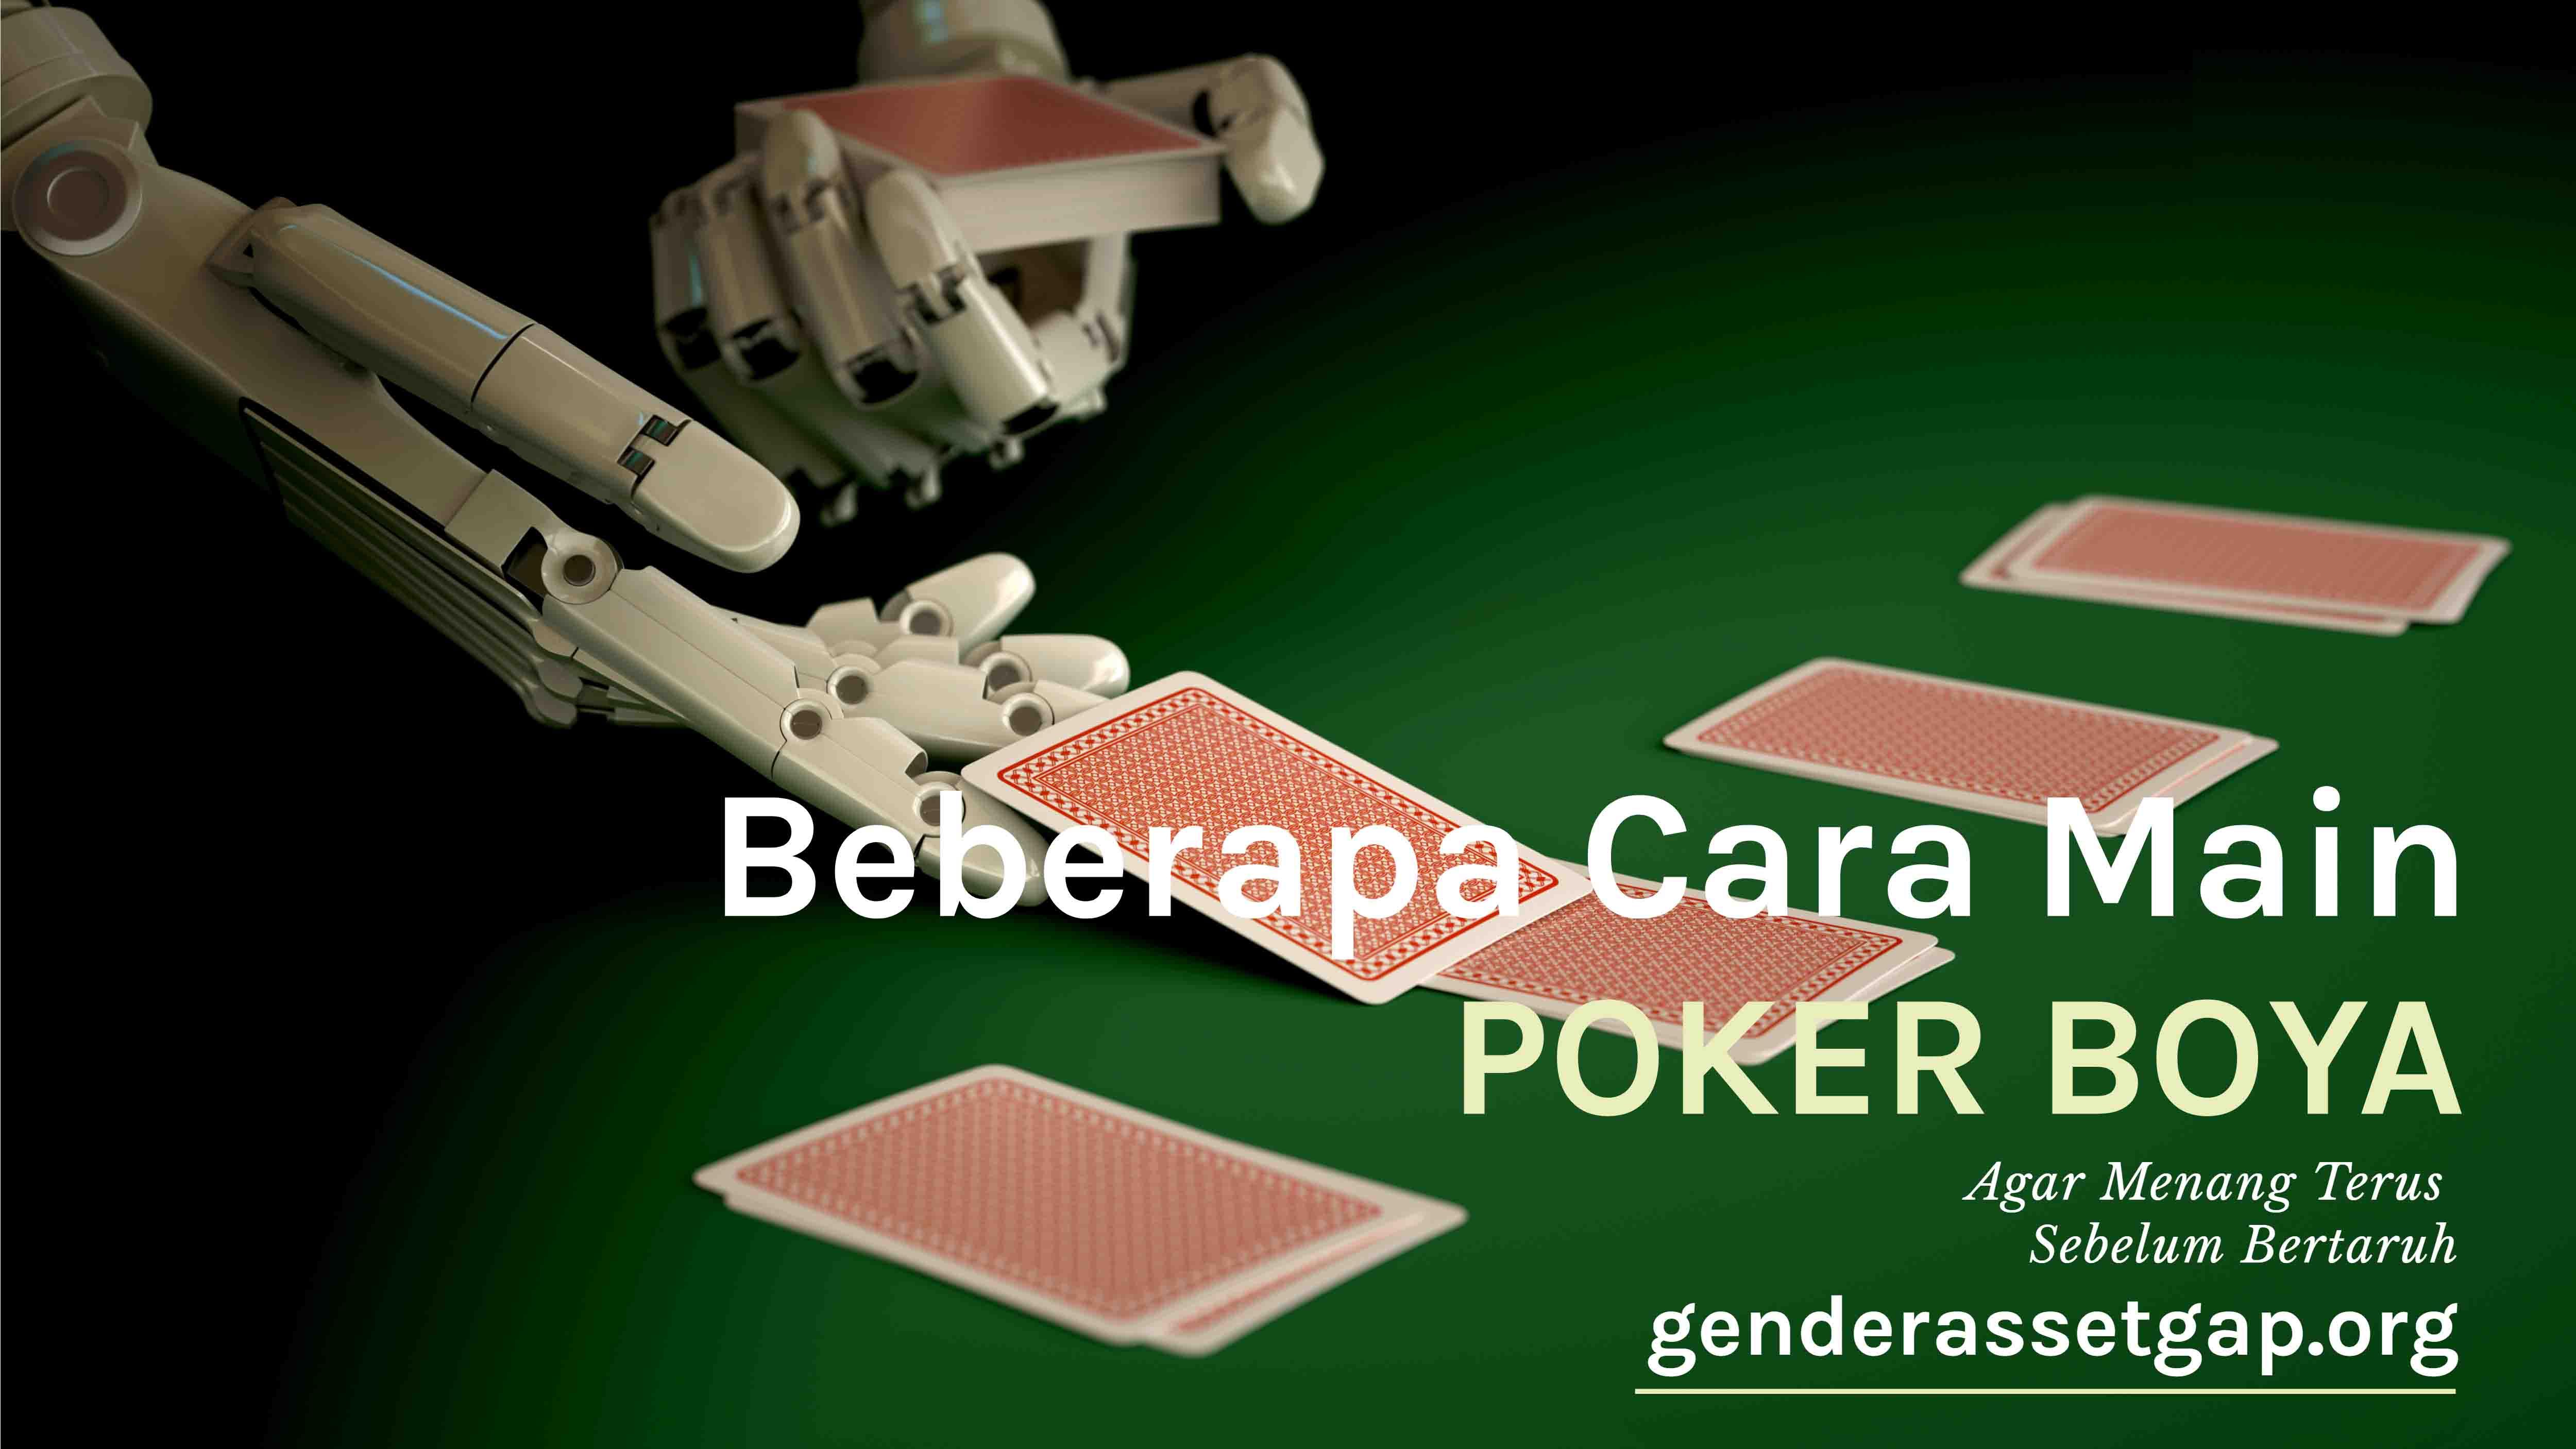 Beberapa Cara Main Poker Boya Agar Menang Terus Sebelum Bertaruh